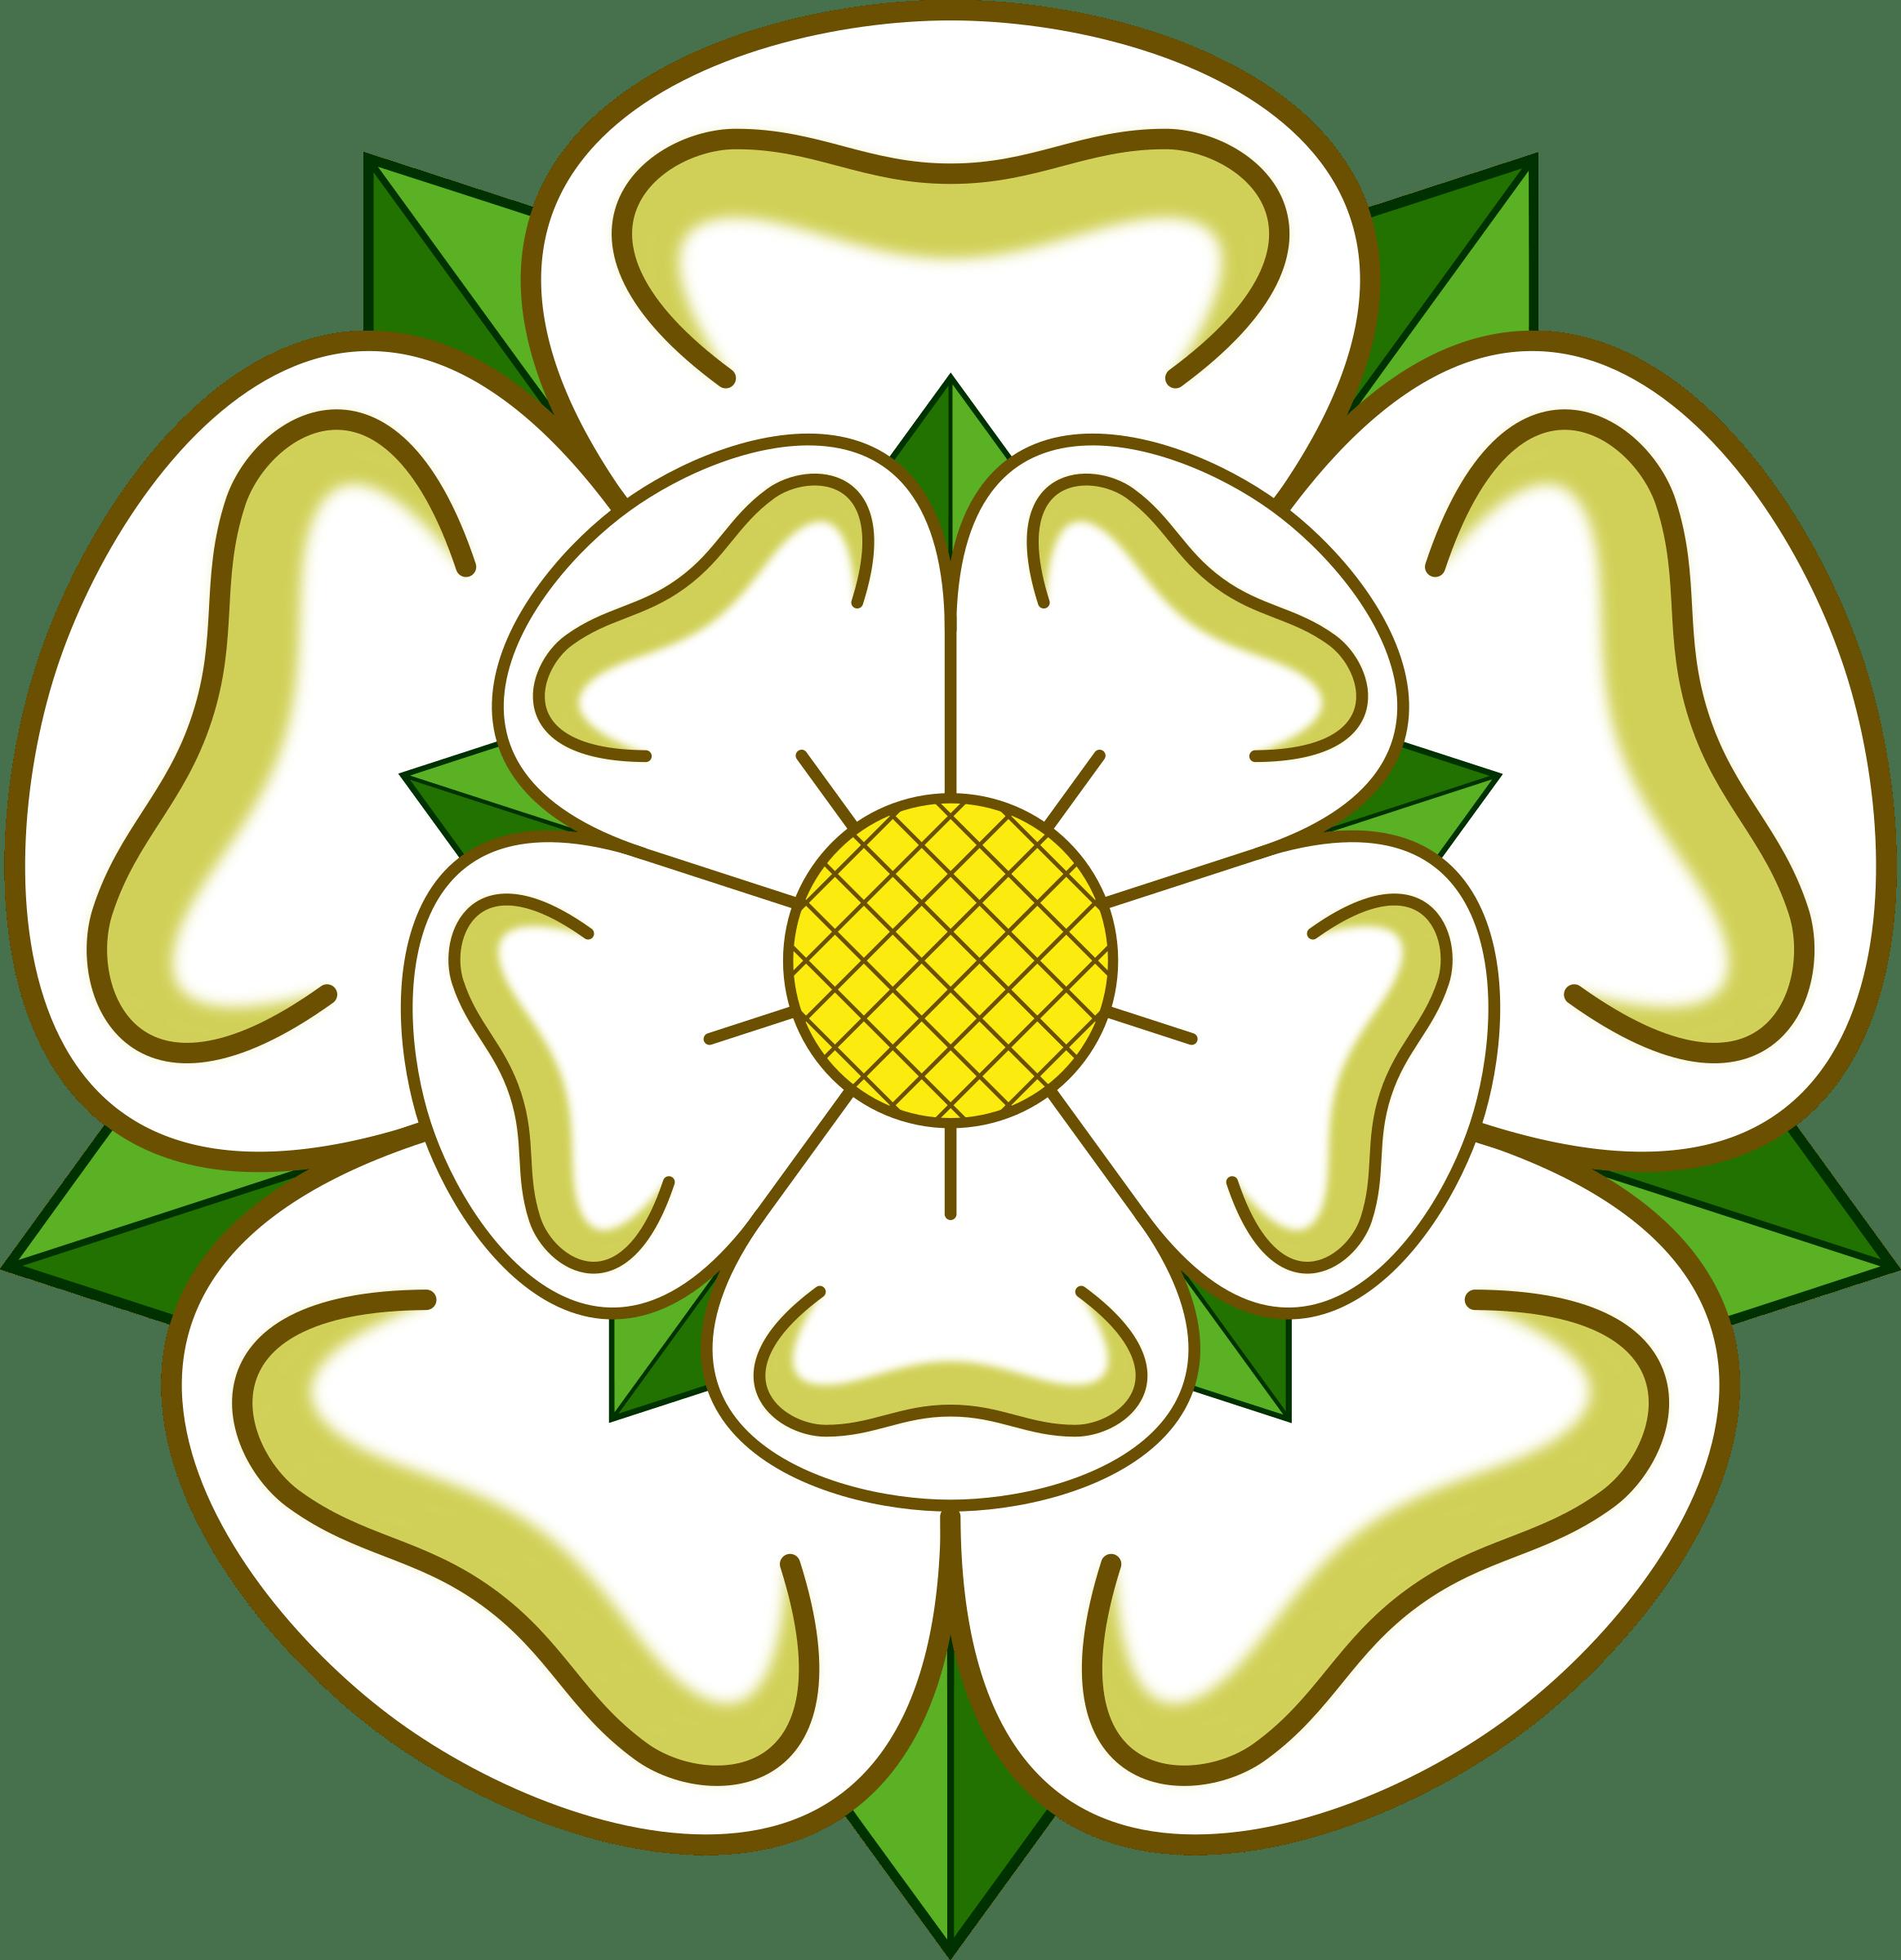 Yorkshire rose clipart stock Yorkshire rose clipart 1 » Clipart Portal stock